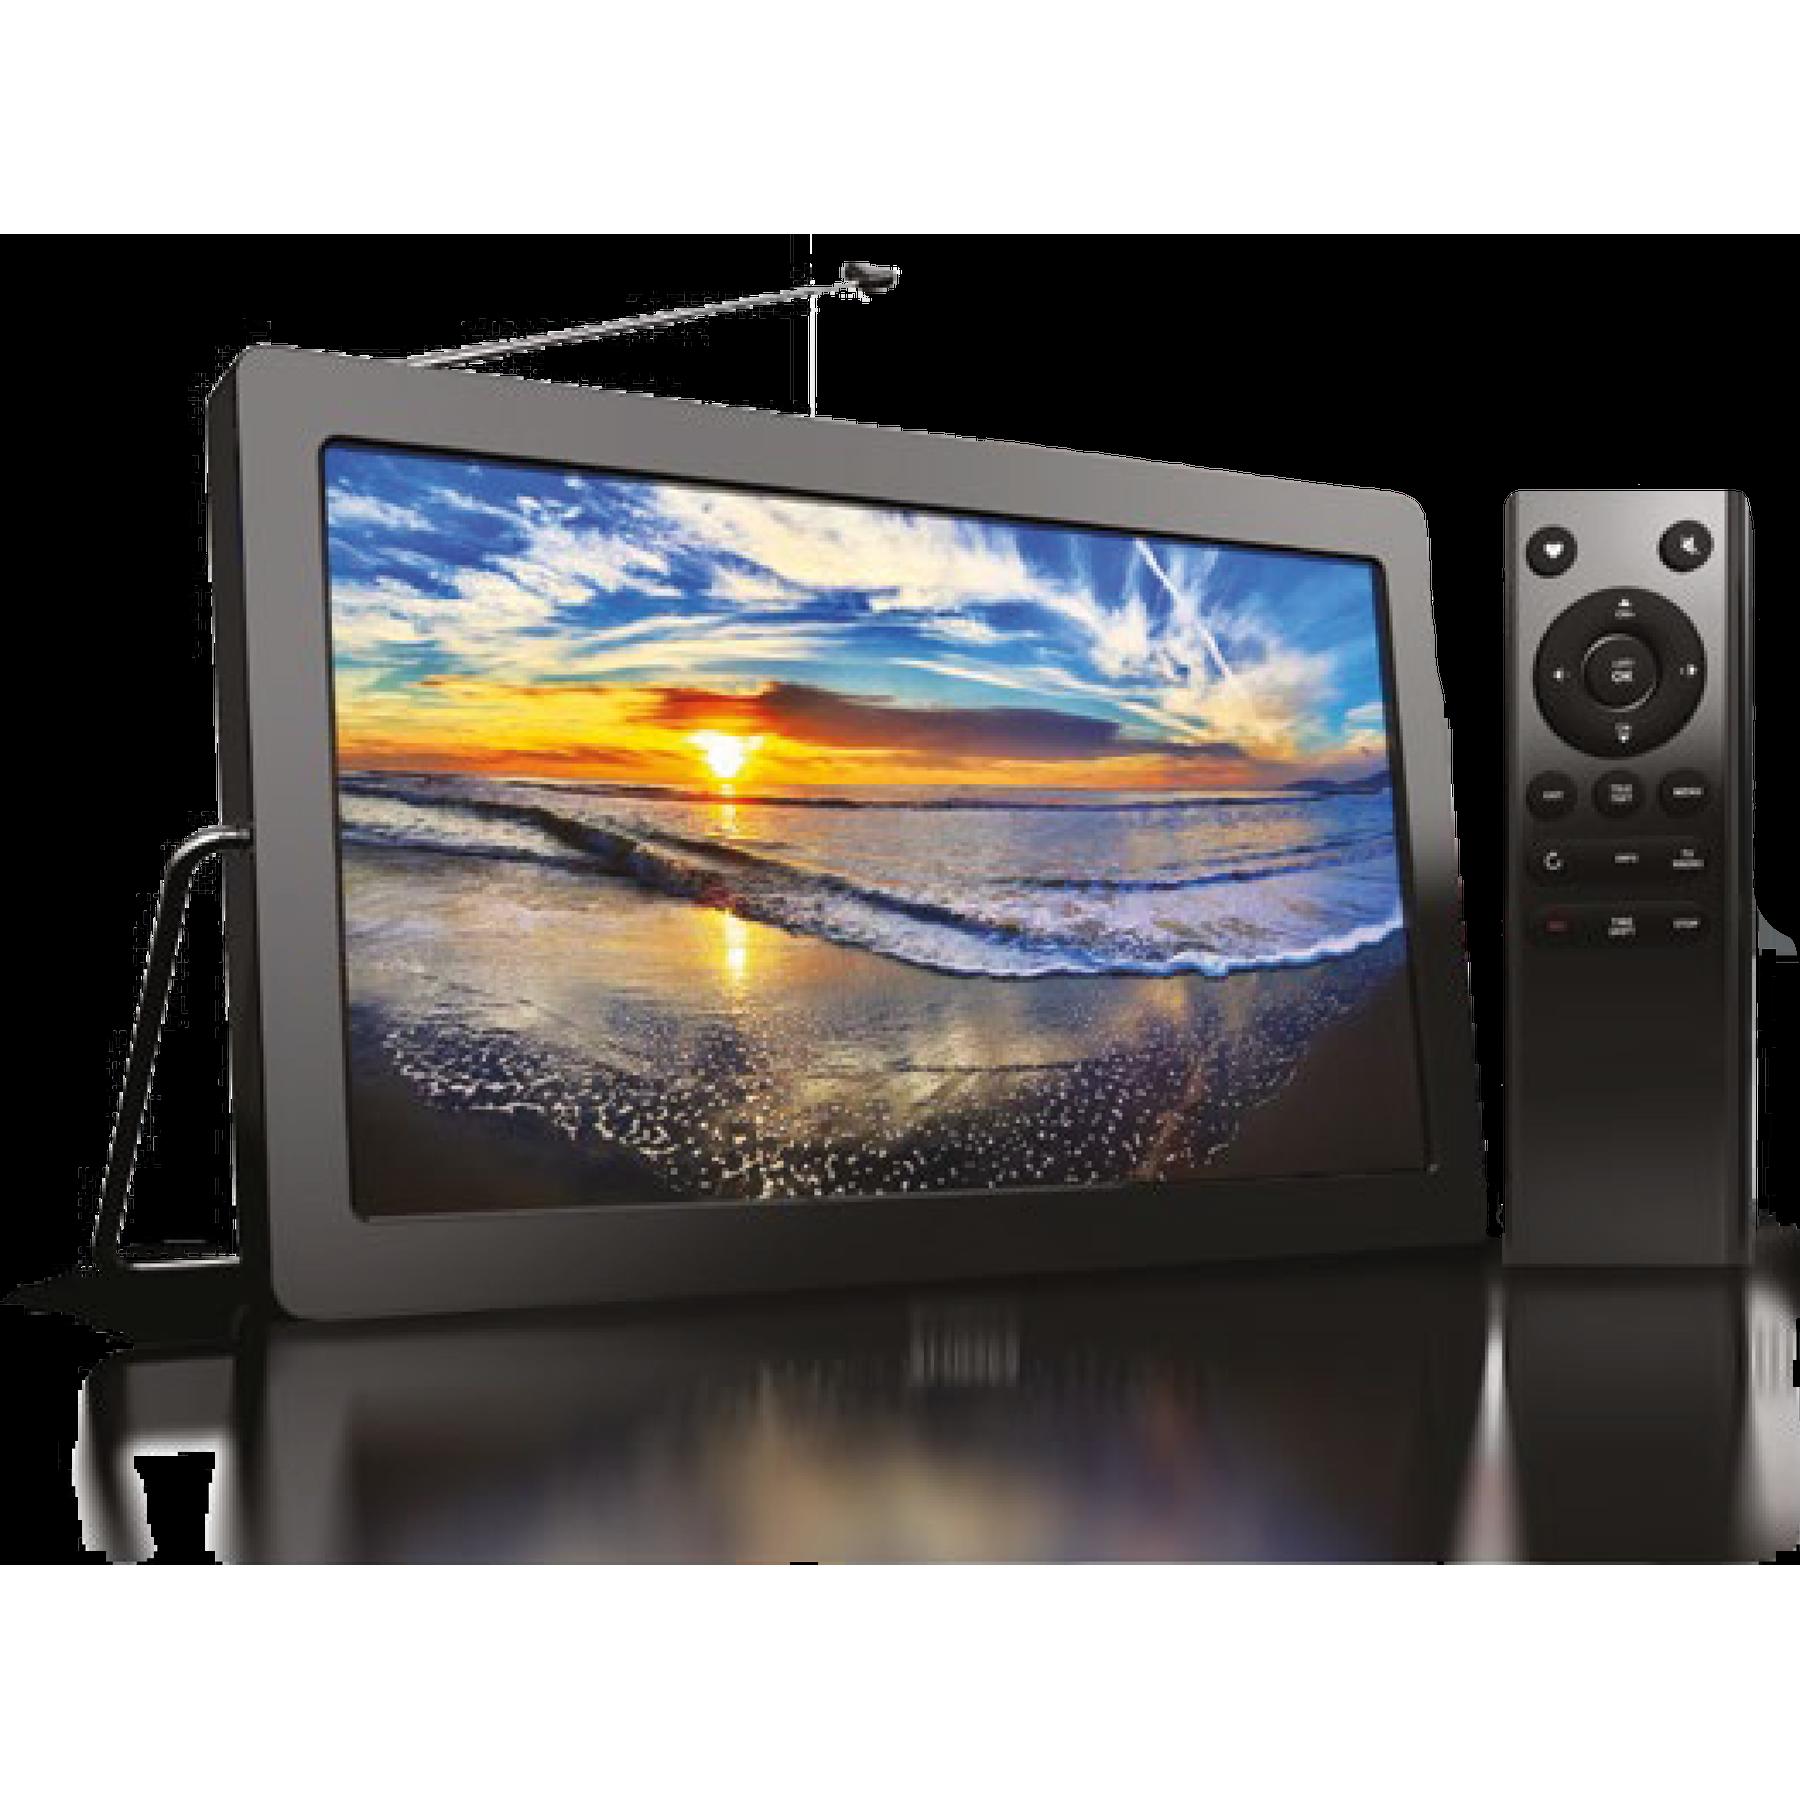 "Телевизор портативный MEZZO 9XLF7T01T2 экран 9"", DVB-T2, батарея 4000мАч на 4-5 часов, пульт, режим приставки с HDMI выходом."